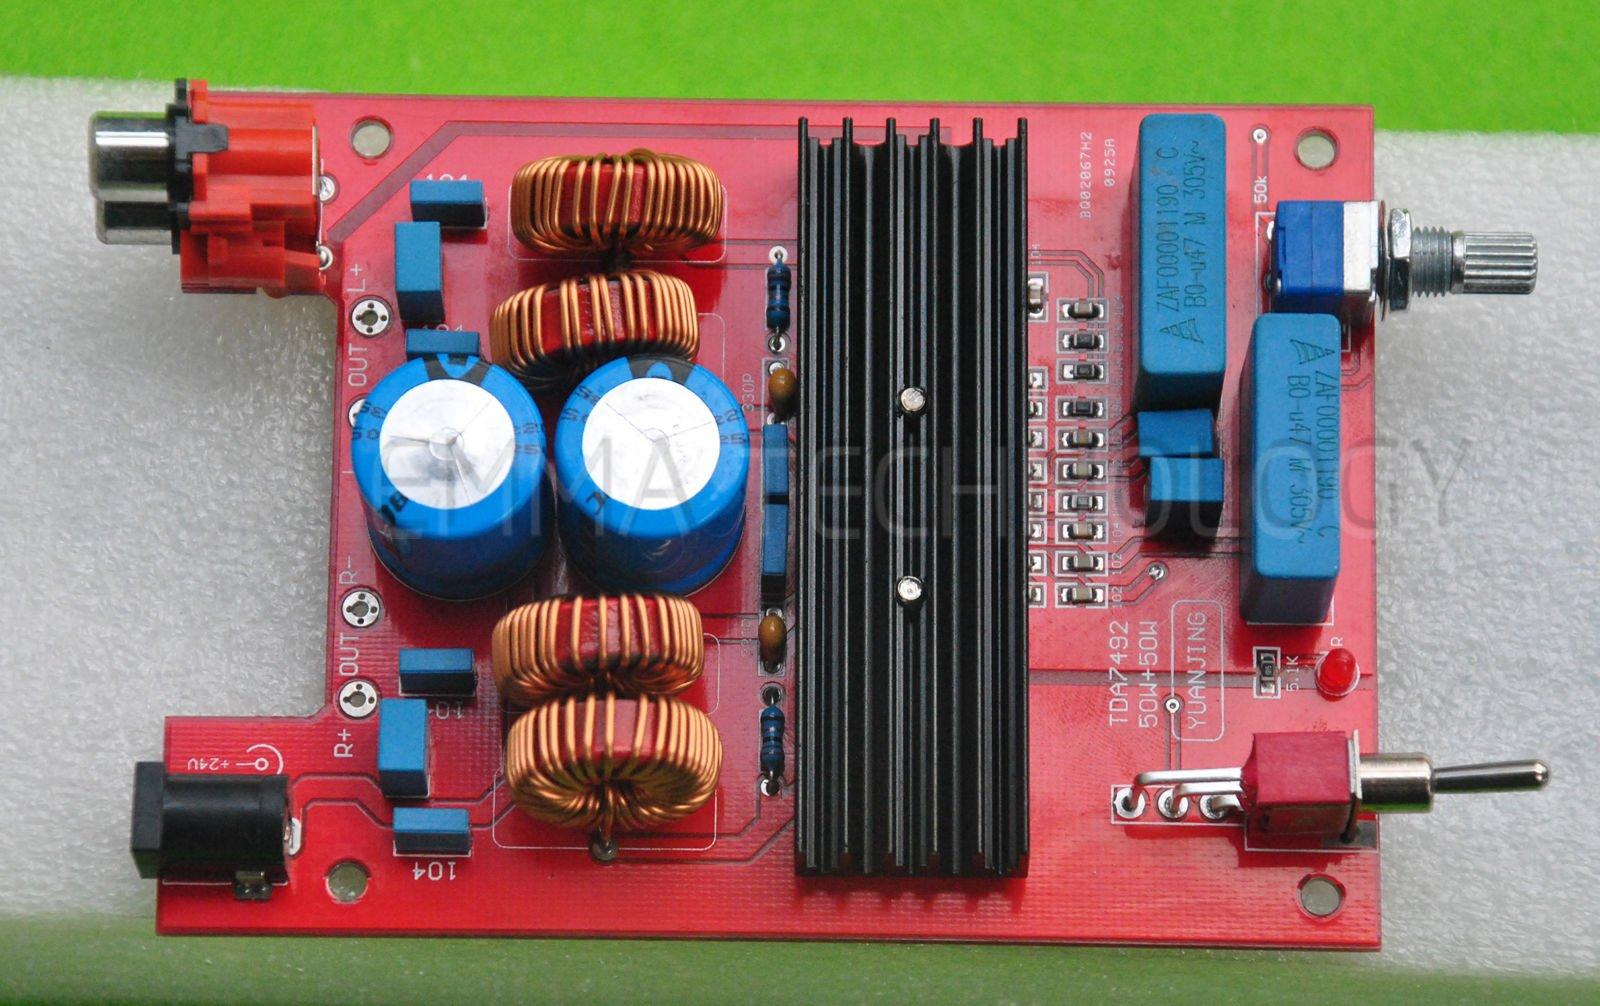 Finished Tda7492 Power Amplifier Board 50w+50w Dc20v to Dc24v 5a